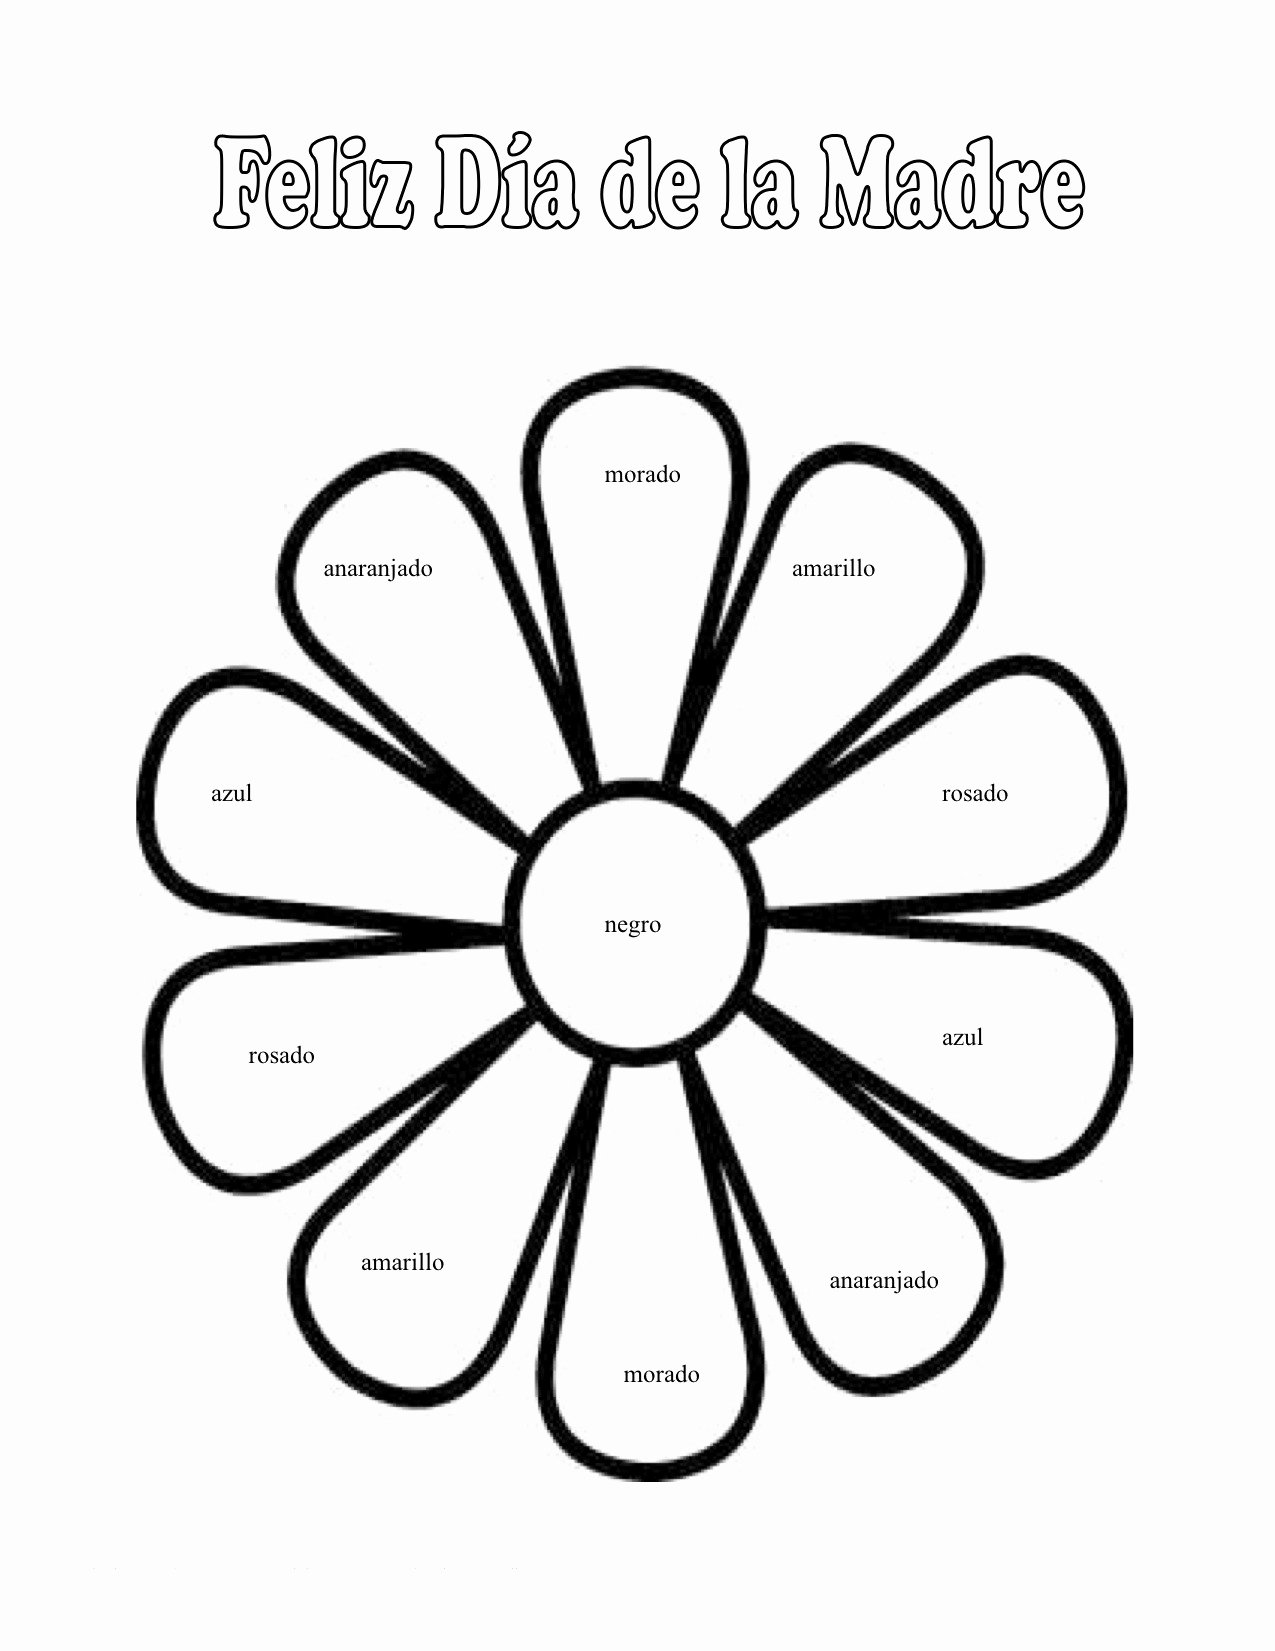 Spanish Color Worksheets for Preschoolers Fresh Colors Coloring for Preschool at Getdrawings Free Spanish